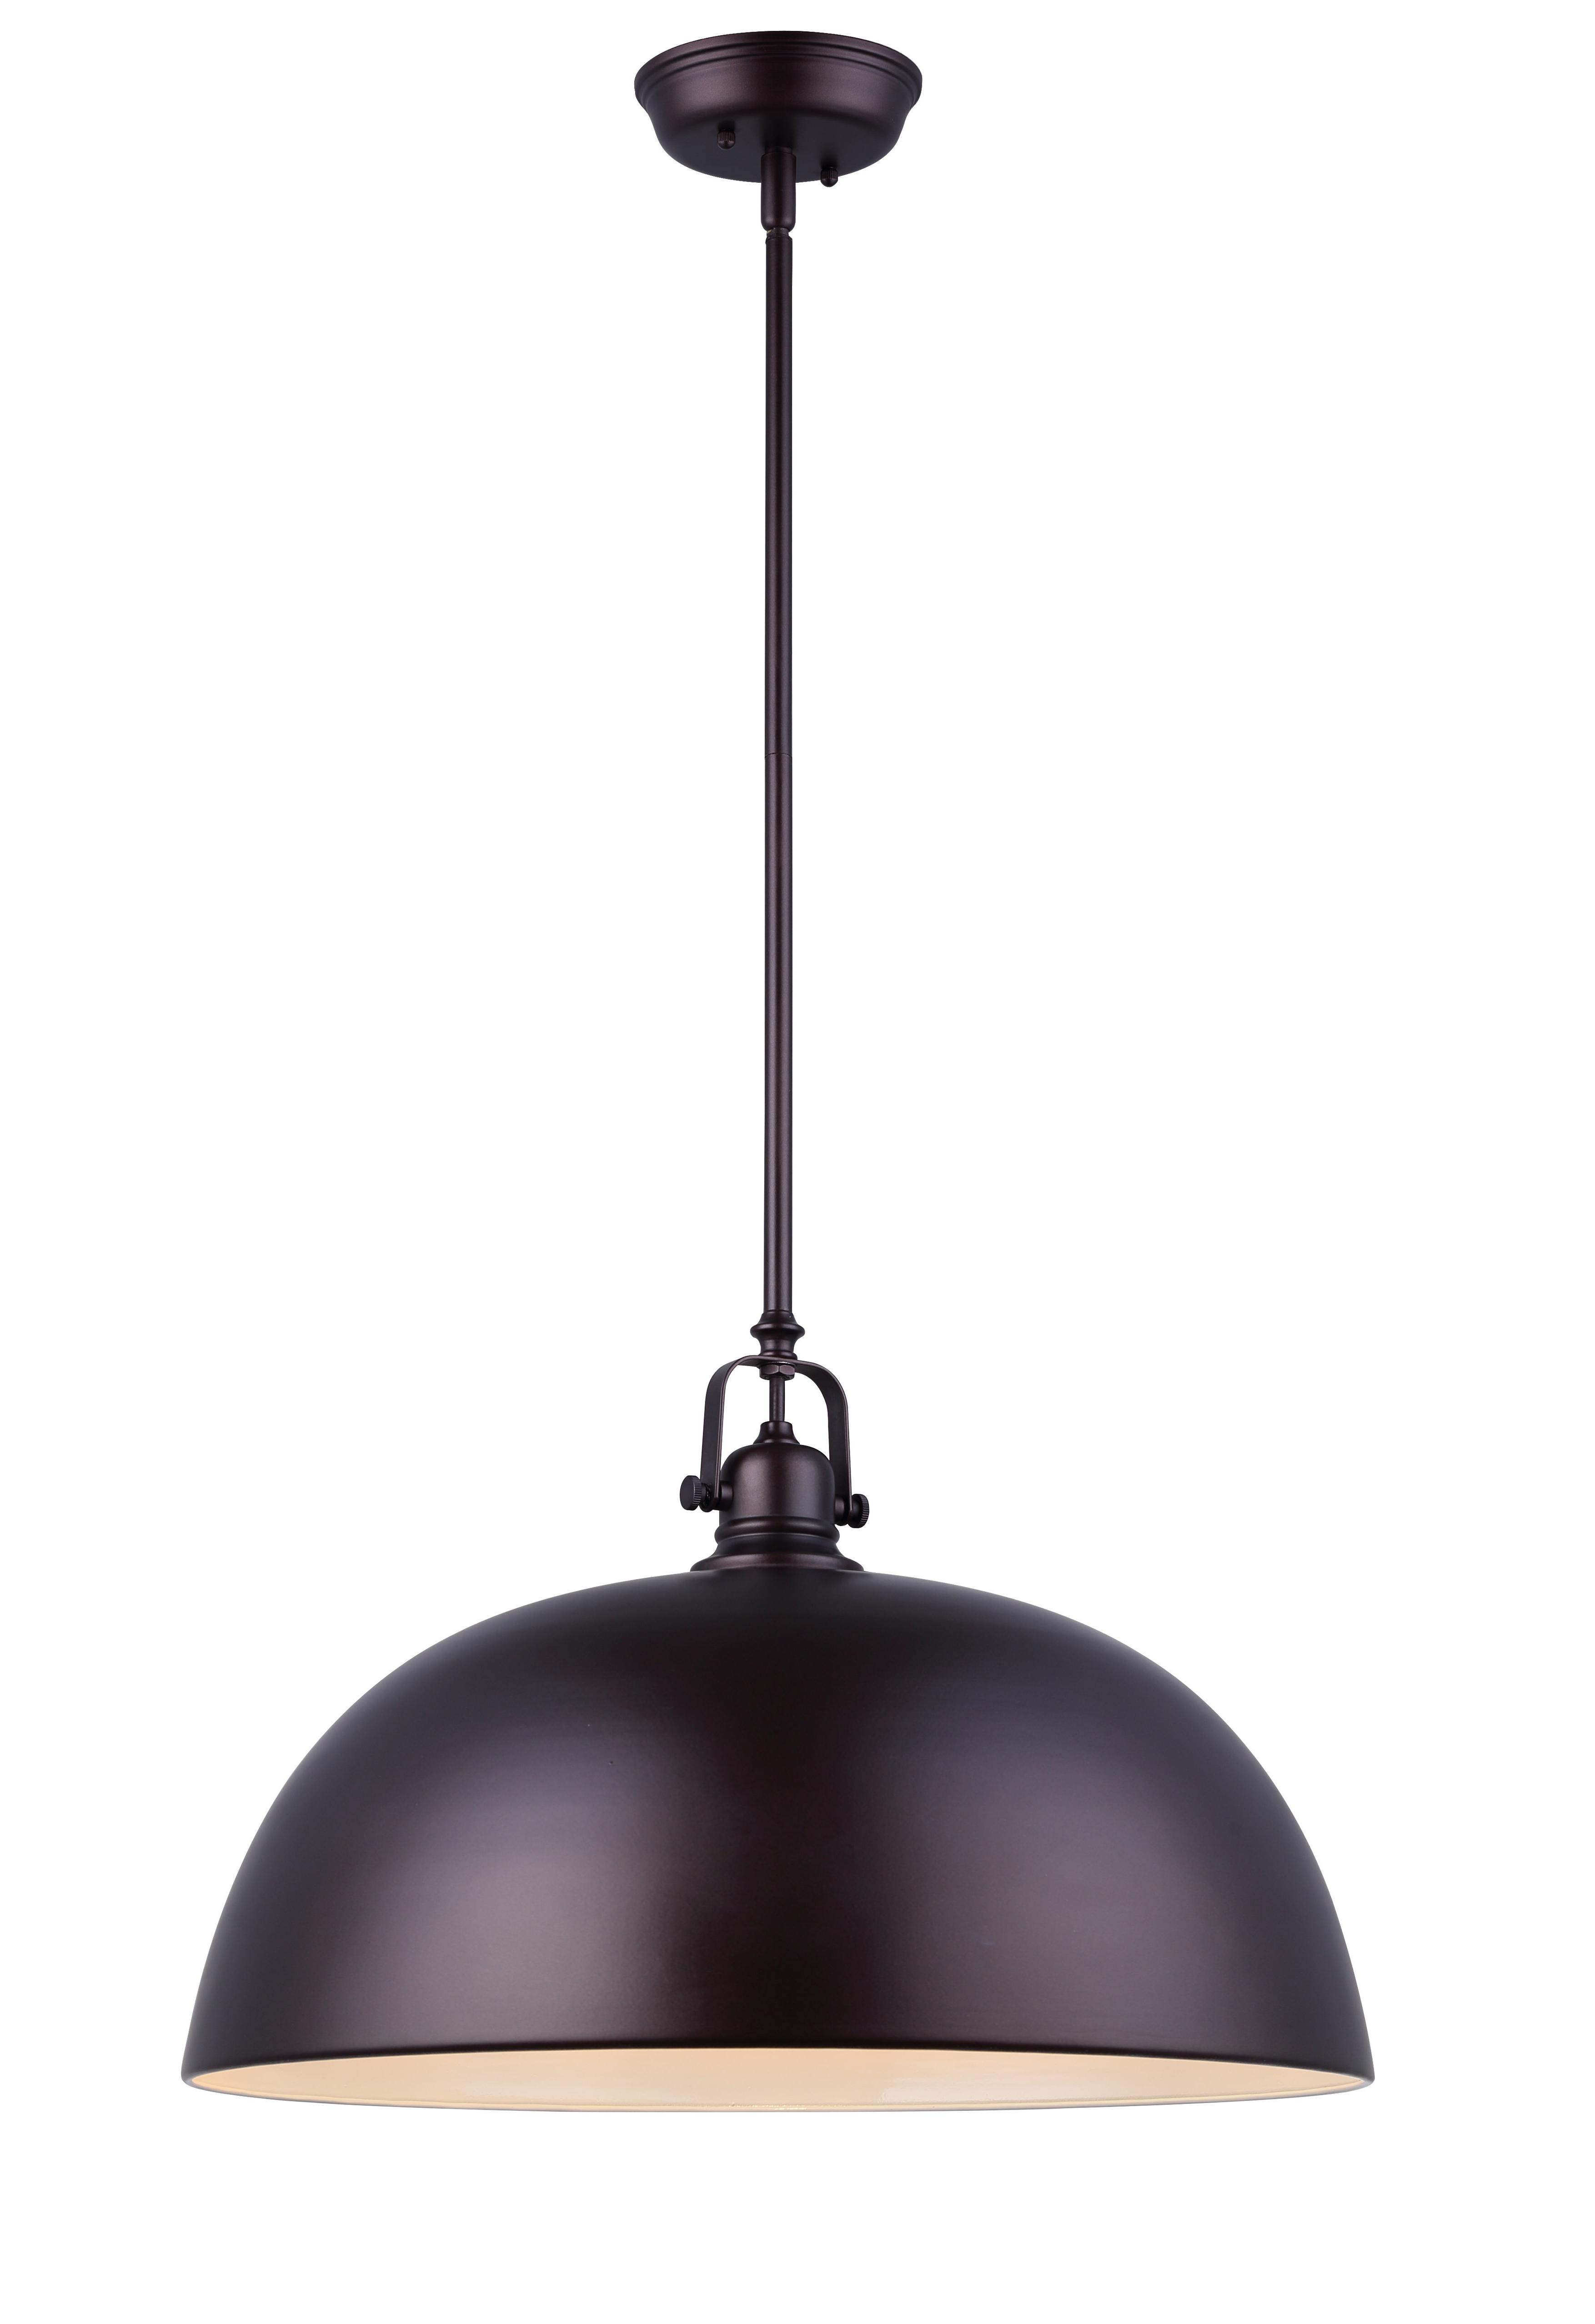 Bodalla 1-Light Single Dome Pendants intended for Trendy Southlake 1-Light Single Dome Pendant